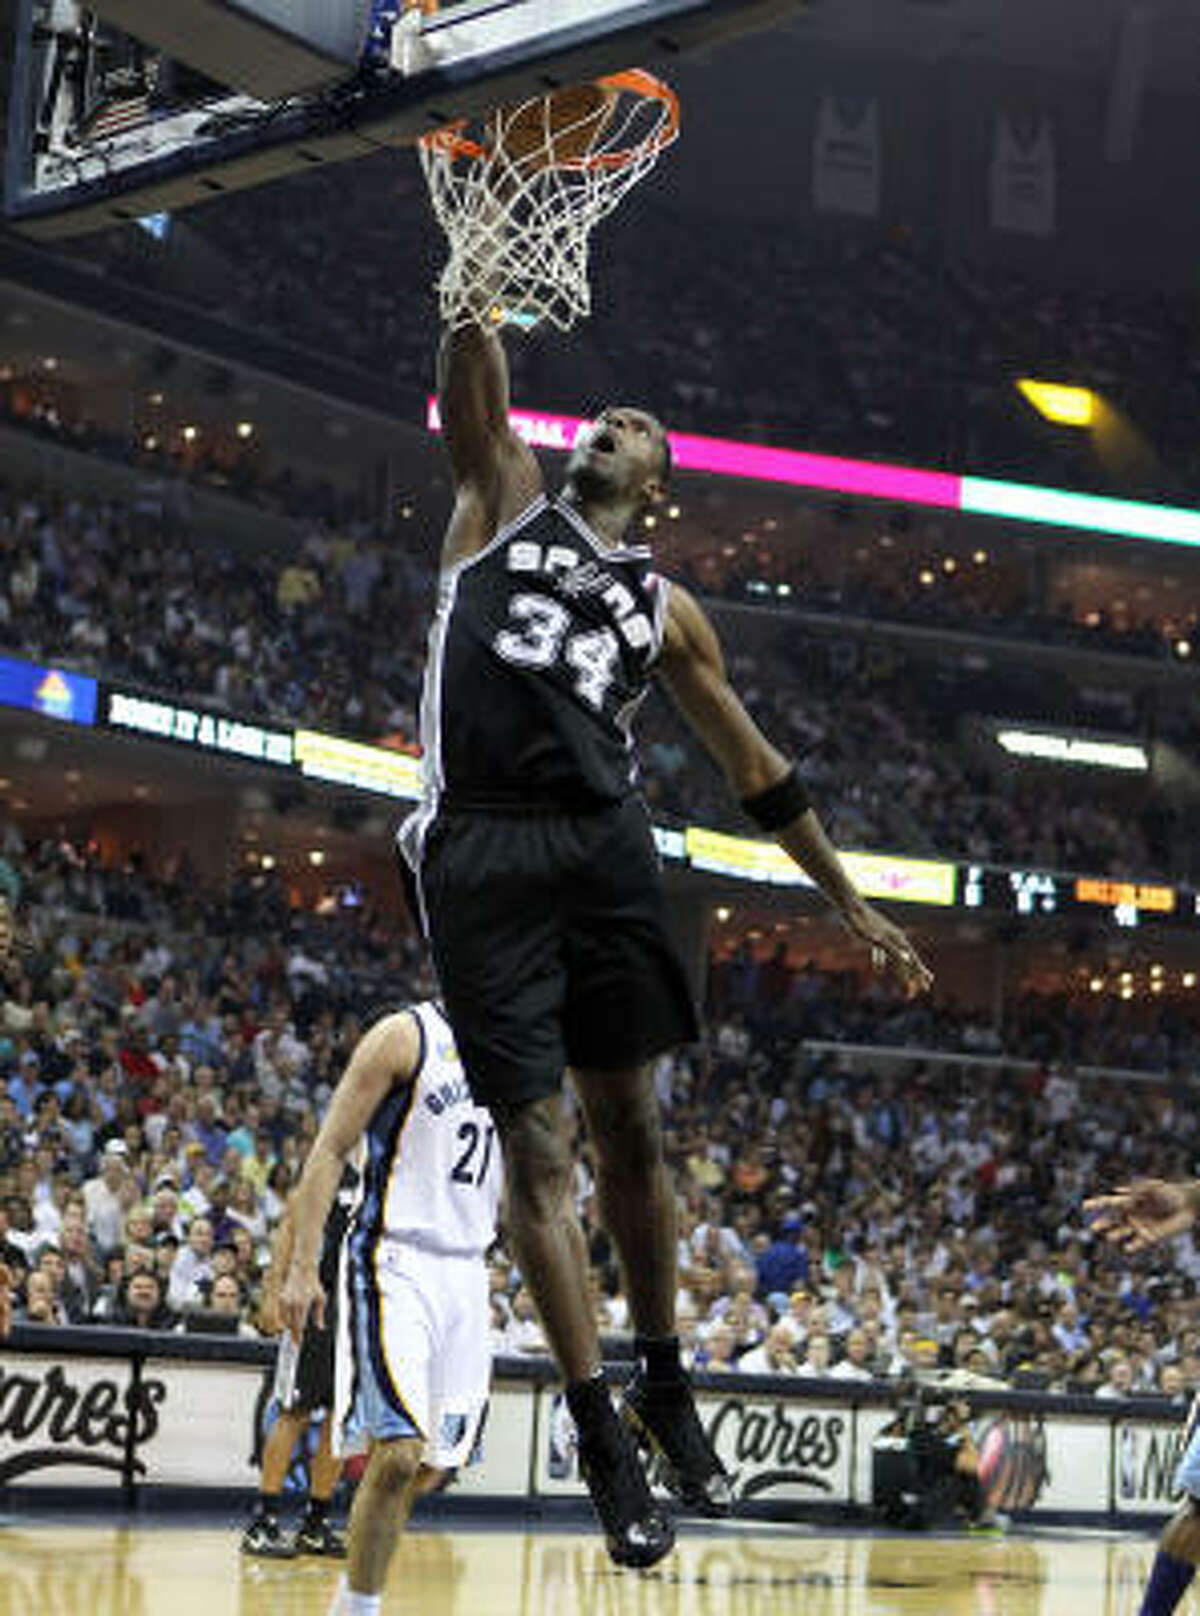 San Antonio's Antonio McDyess throws down a dunk.